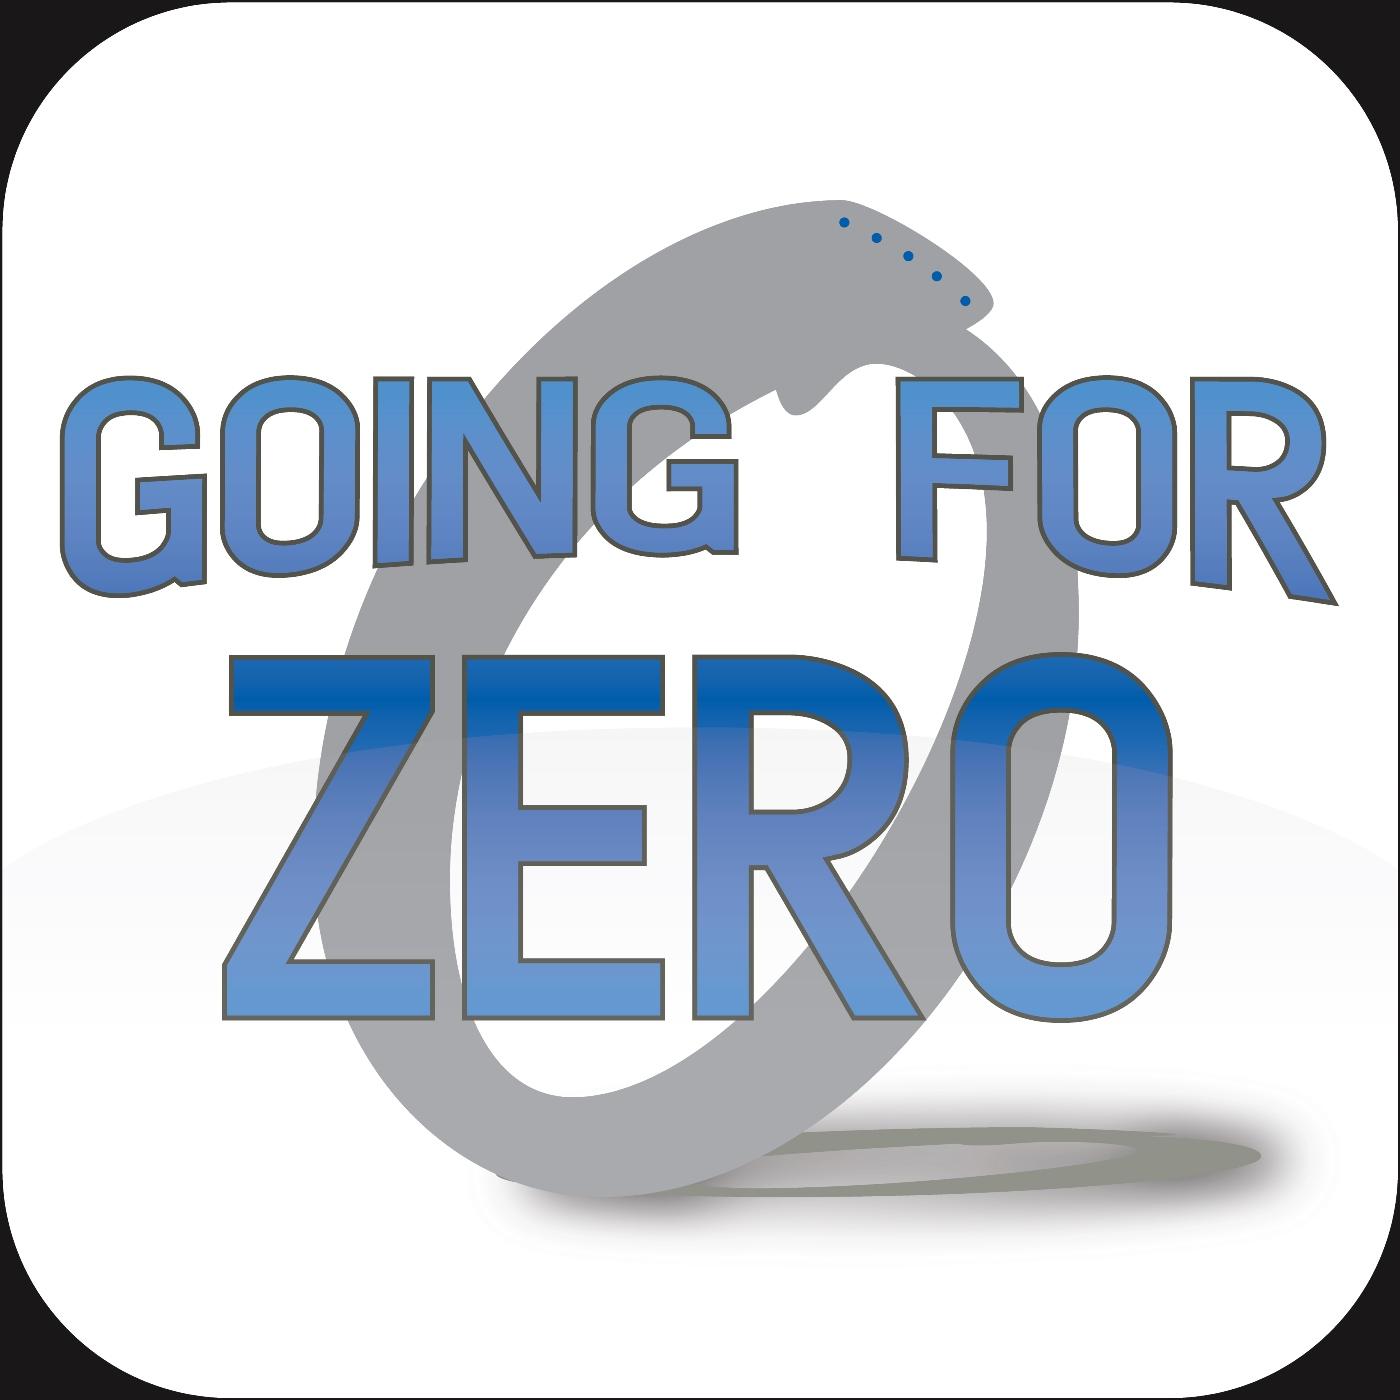 Going for Zero show art